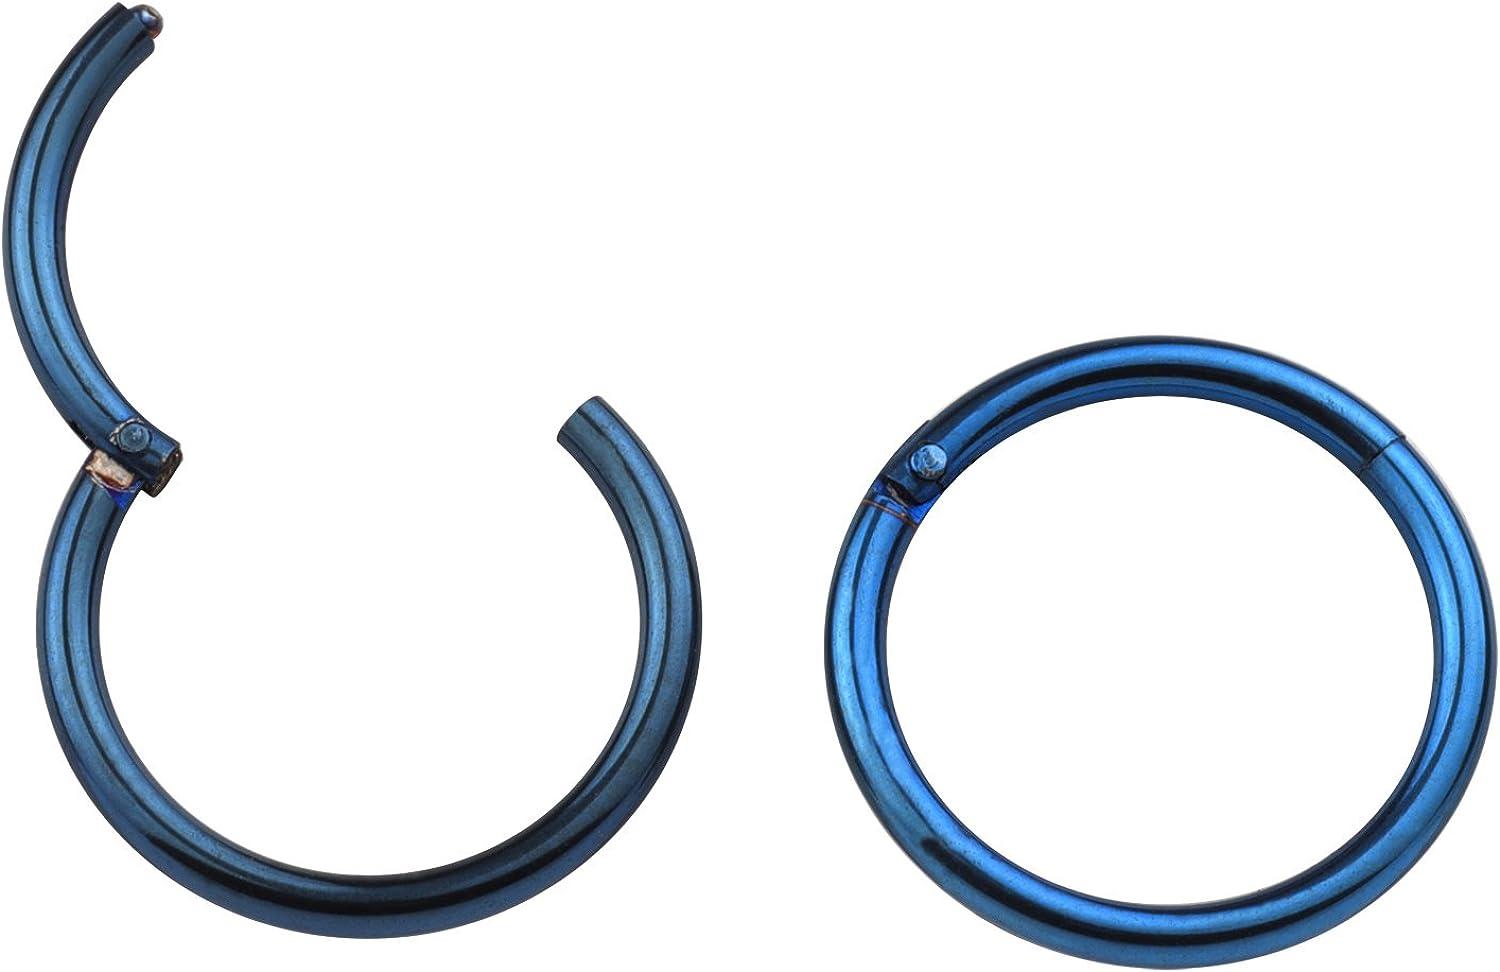 Great my shop 16G Stainless Steel Nose Ring Cartilage Earring Hoop Earrings Hinged Hoops Seamless Ring 10mm